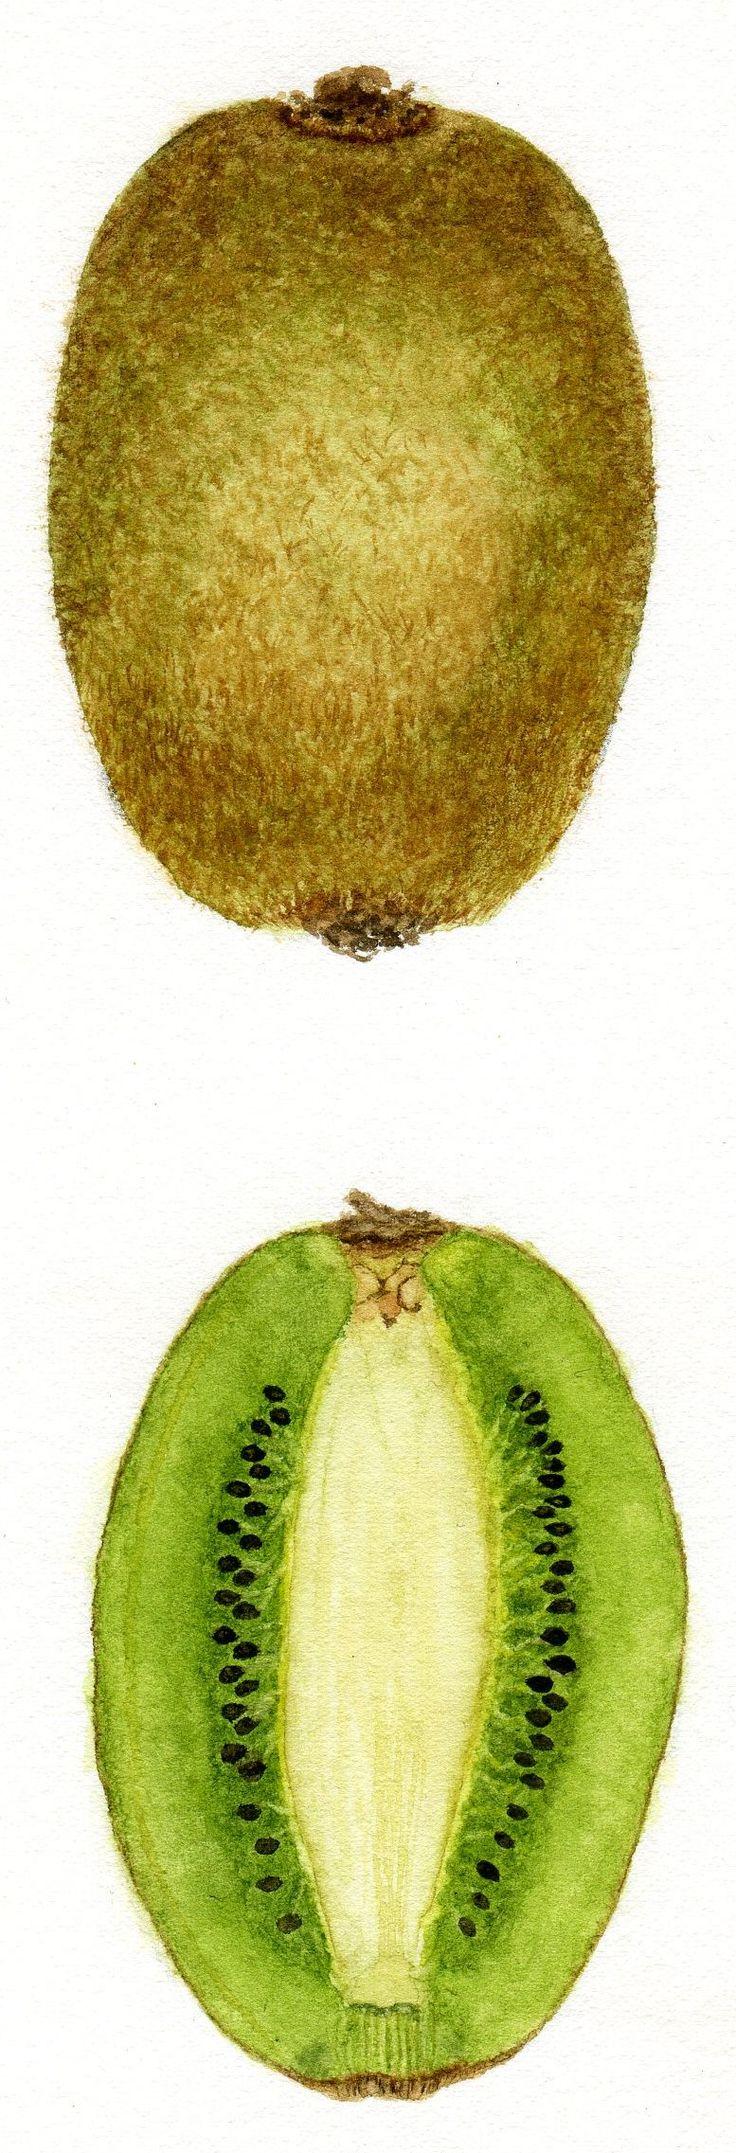 Kiwi © Jessica Frans